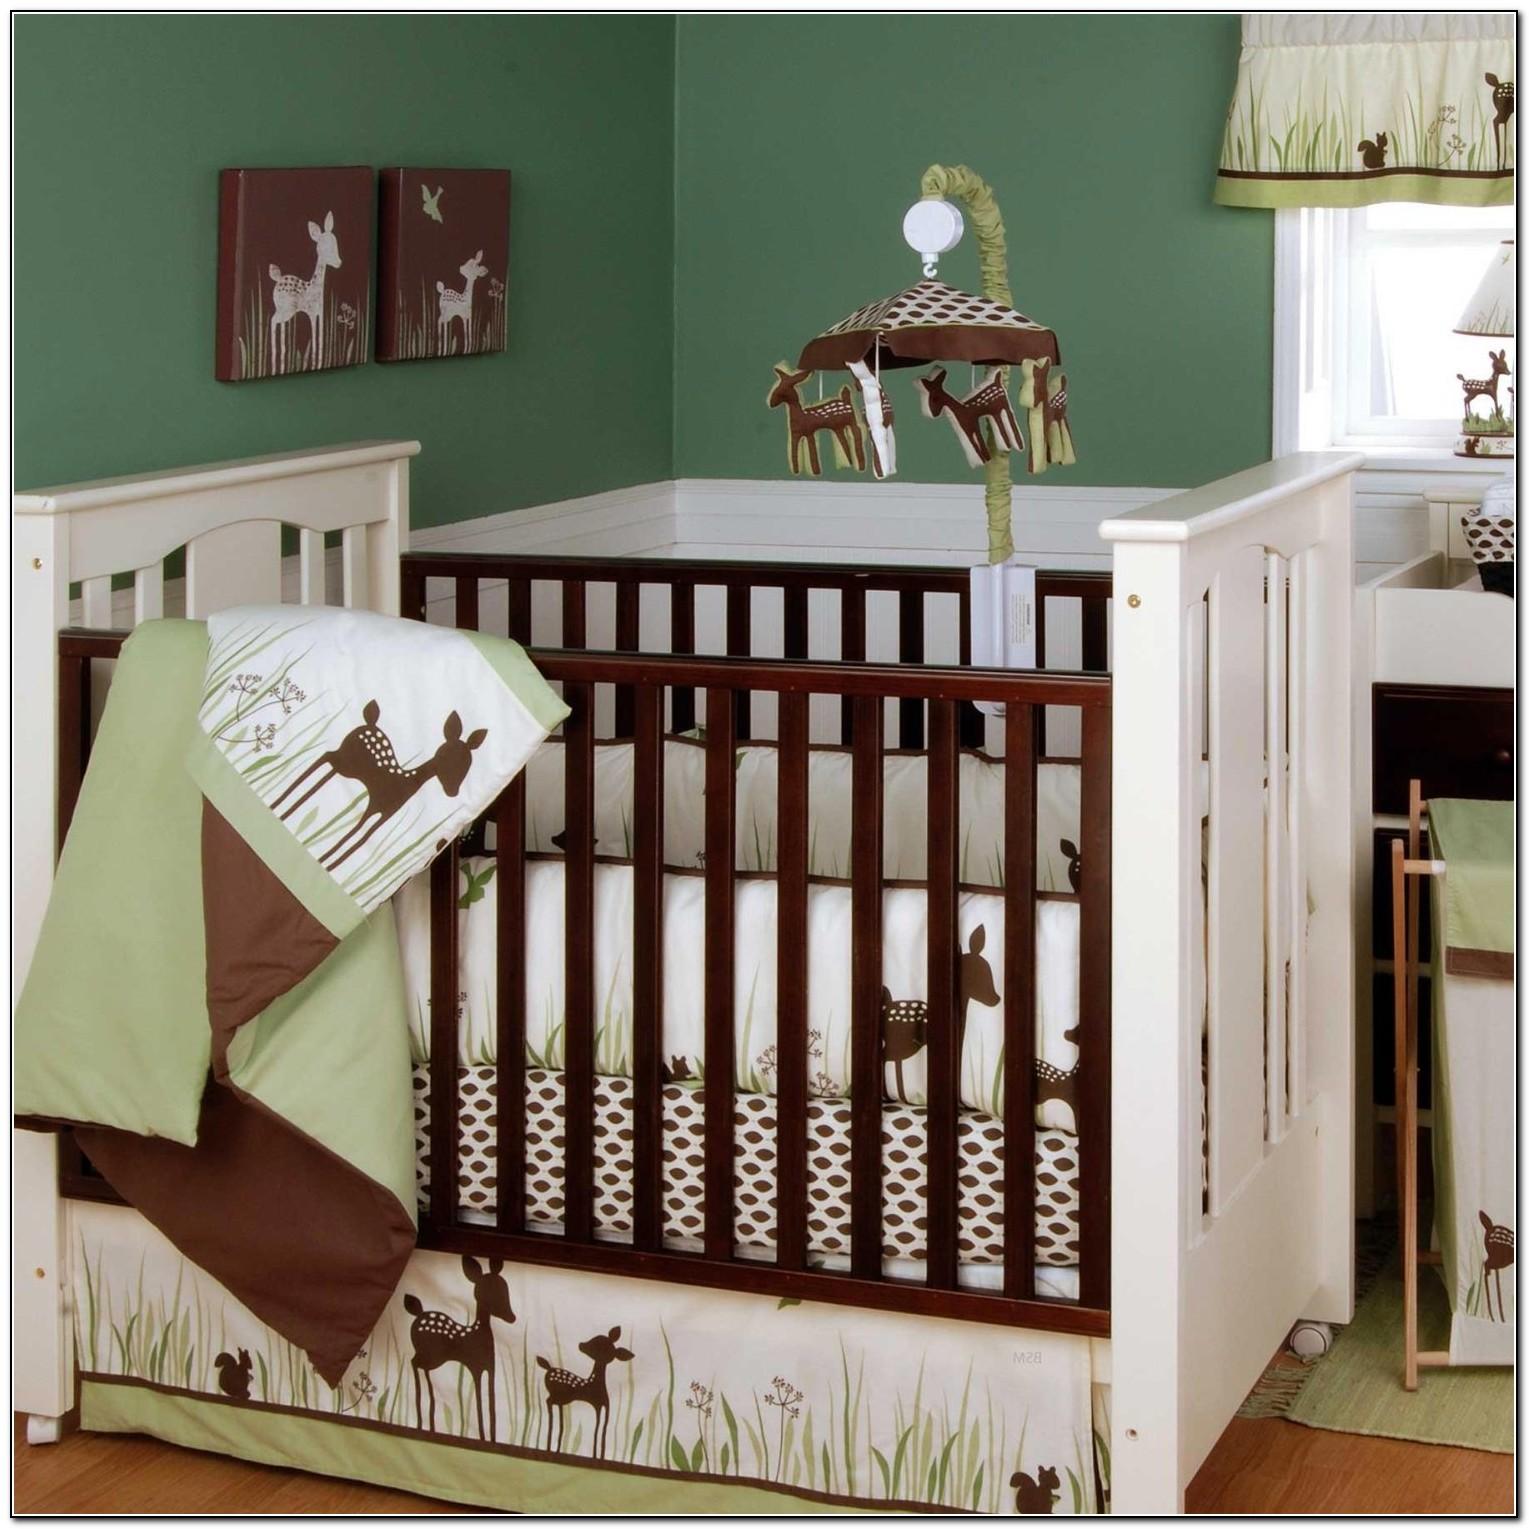 Baby Crib Bedding Sets Under $50